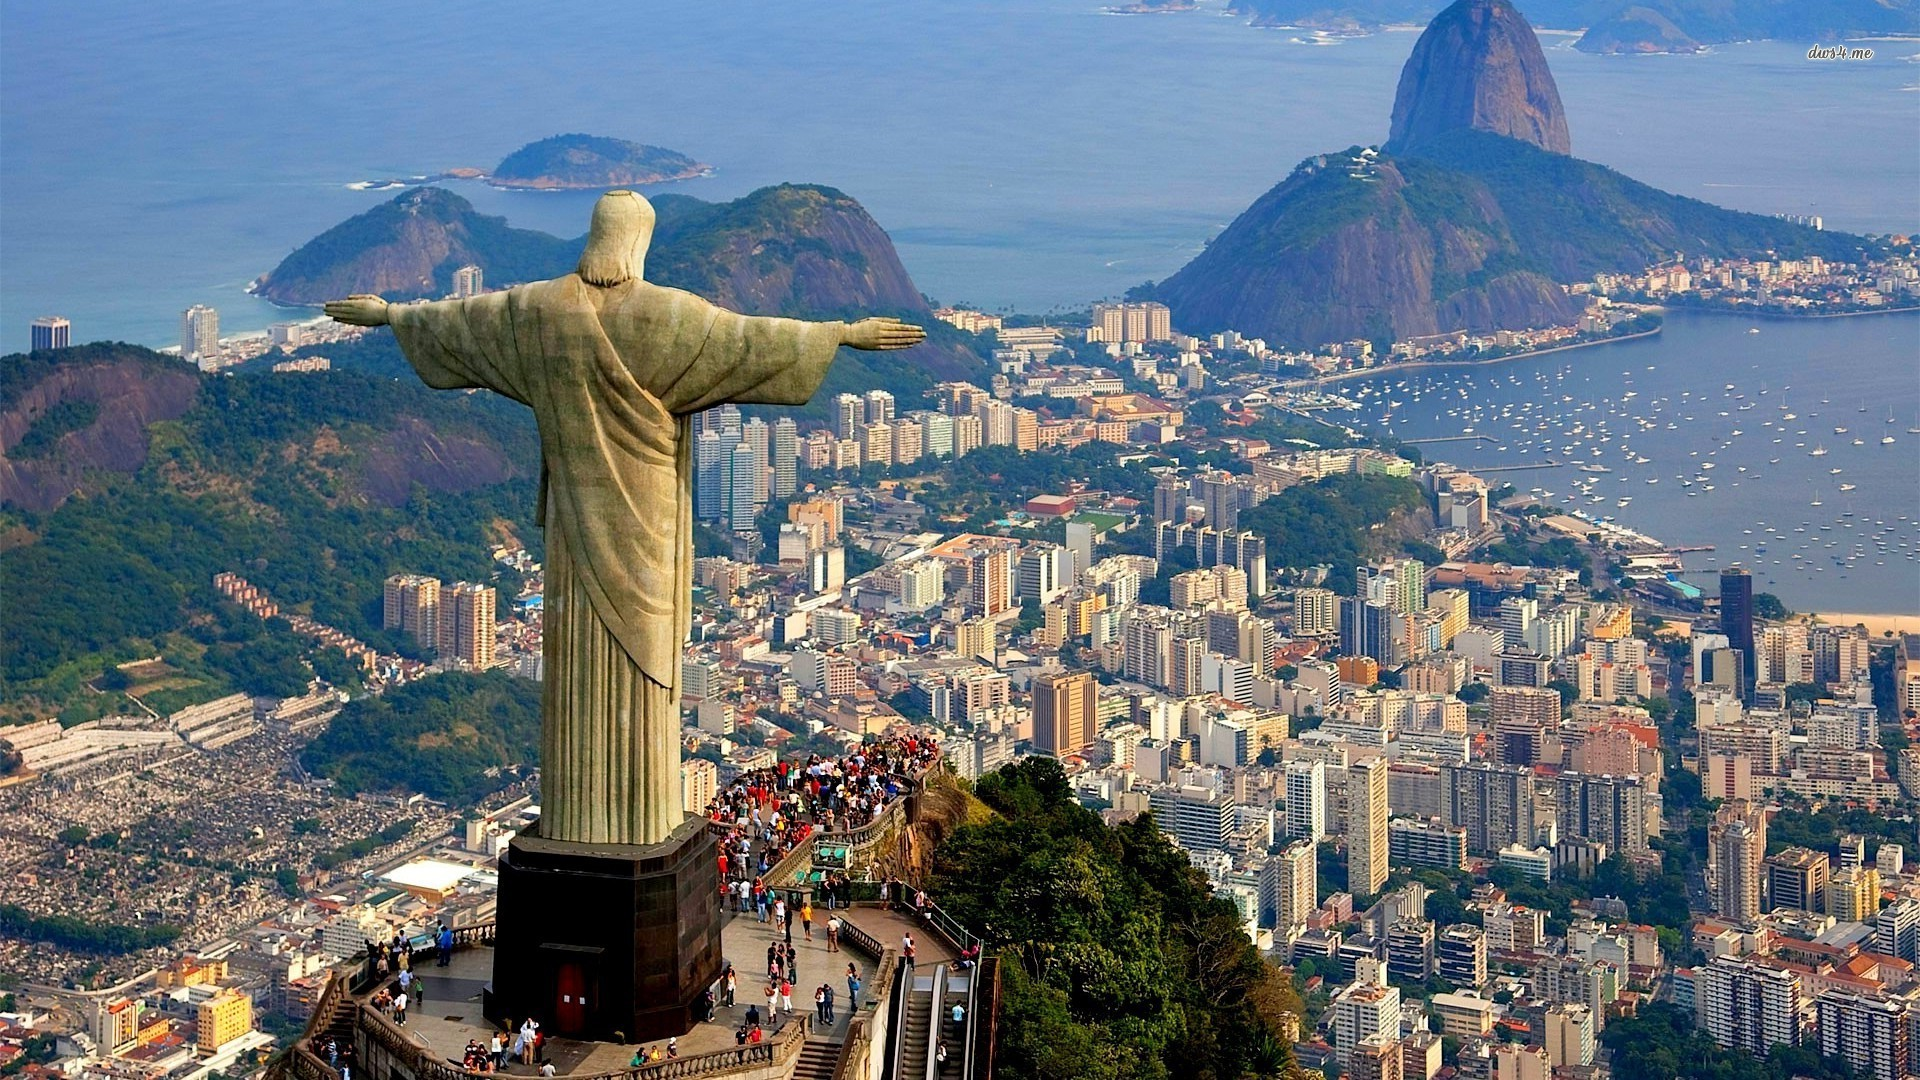 Rio de Janeiro City Wallpapers Live HD Wallpaper HQ 1920x1080